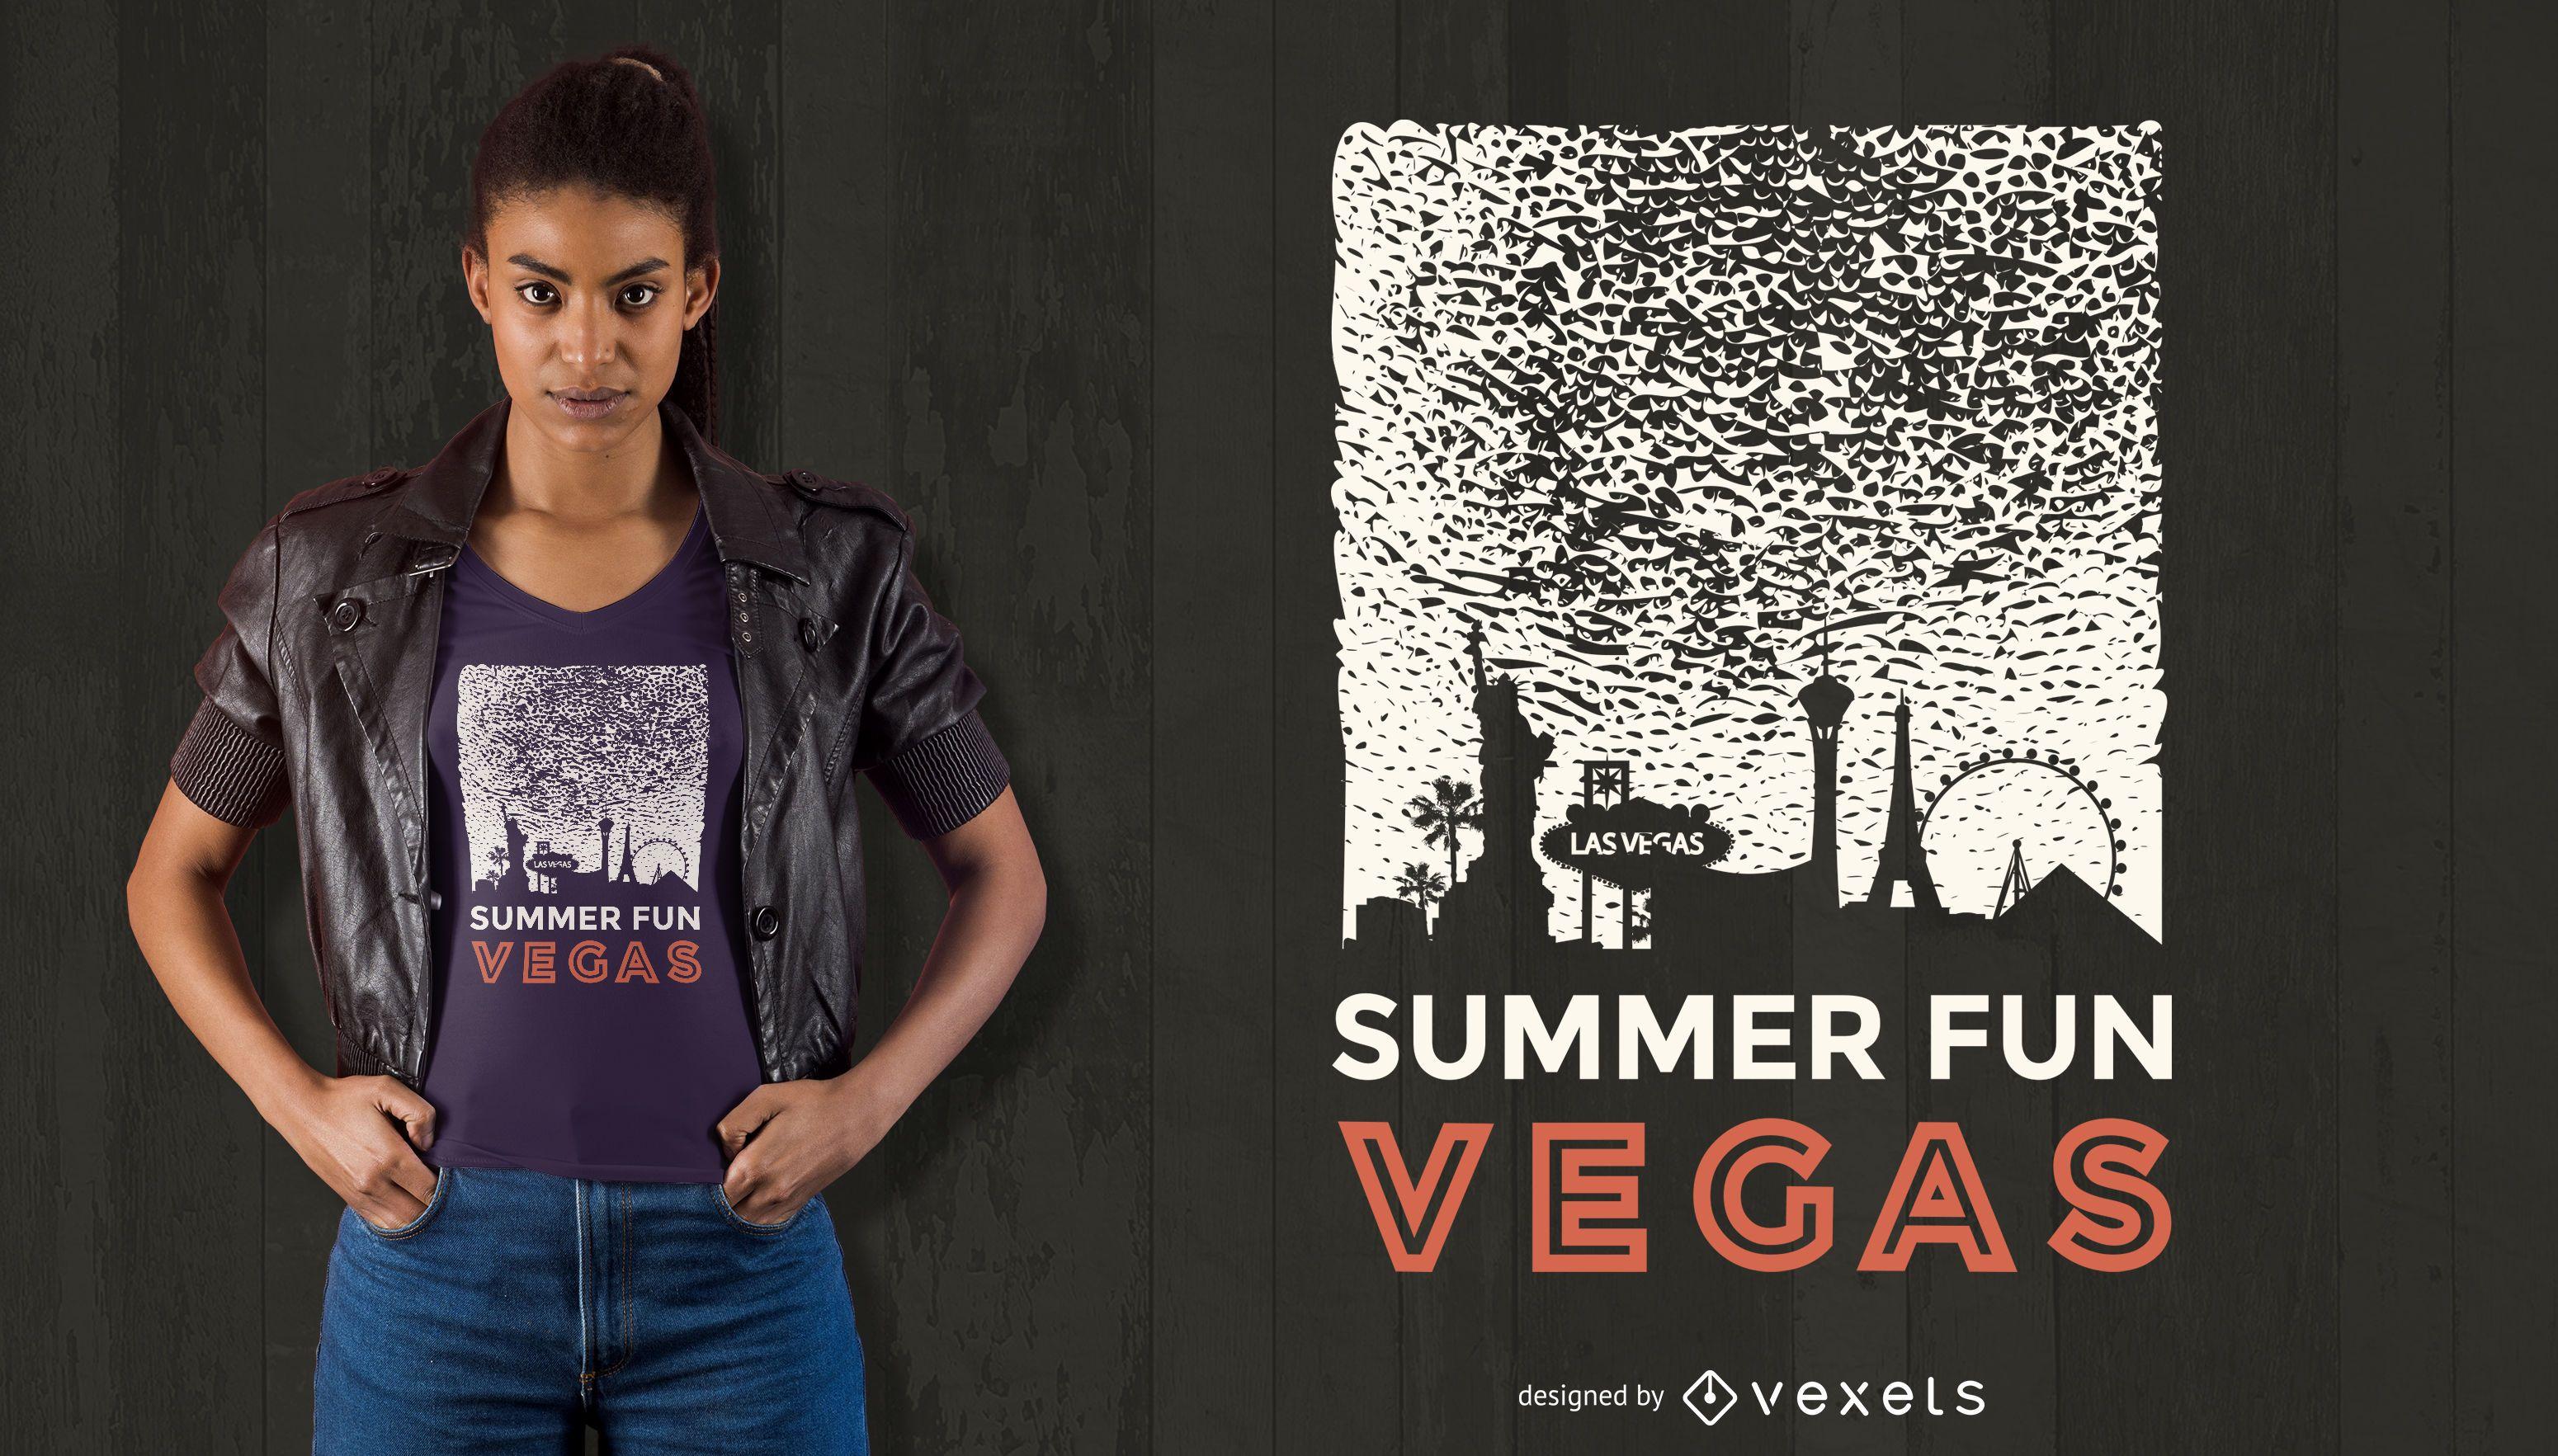 Diseño de camiseta Summer Fun Vegas